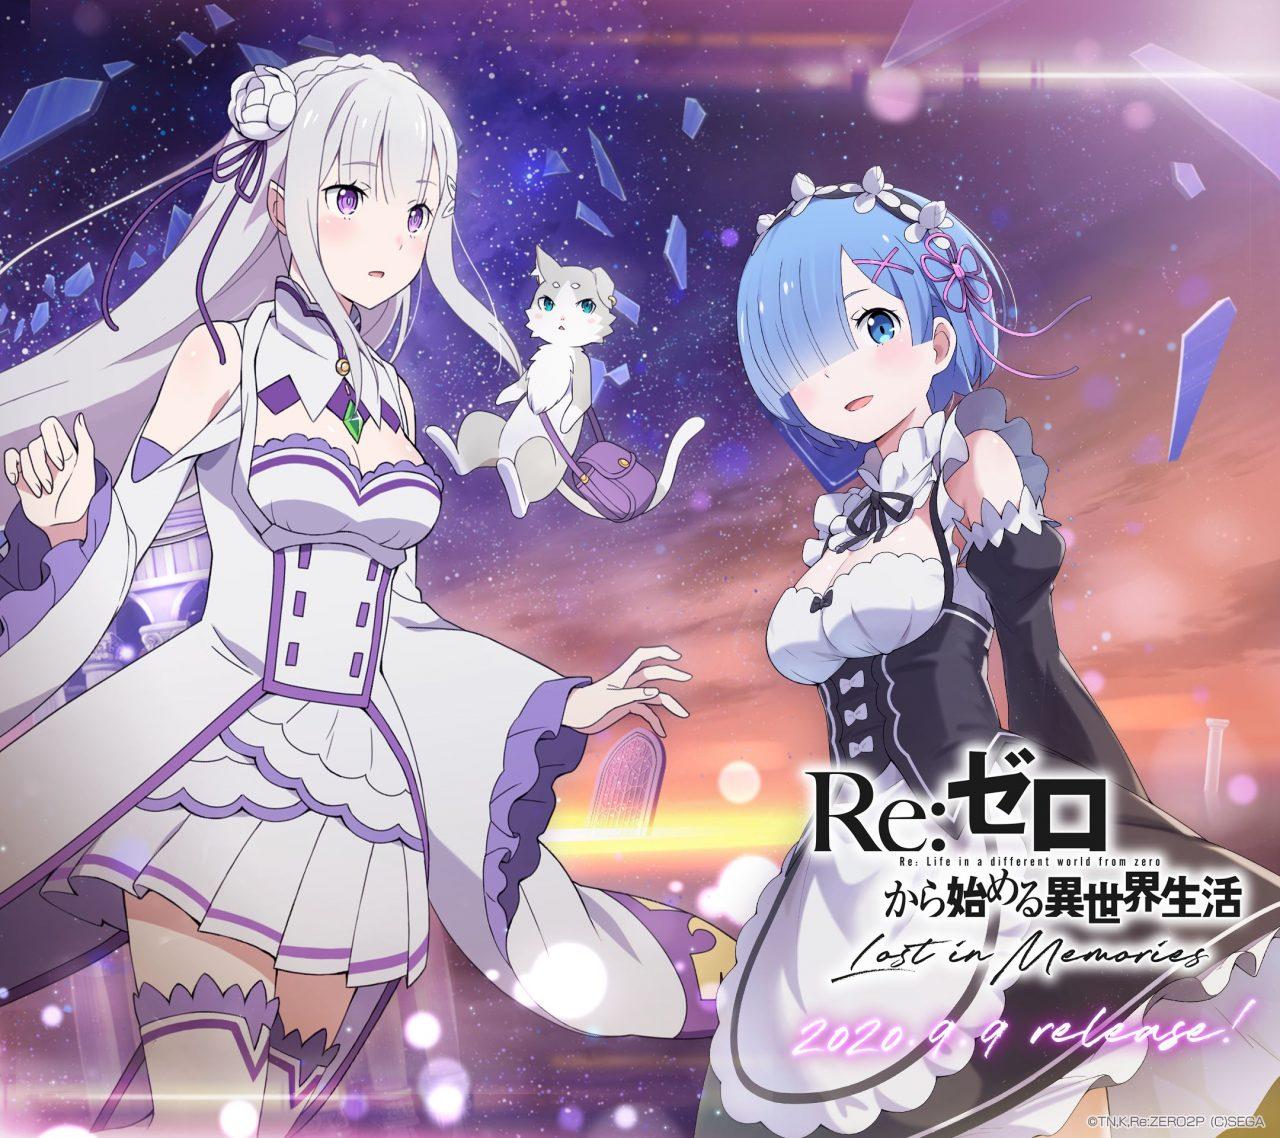 『Re:ゼロから始める異世界生活 Lost in Memories』が正式配信開始!